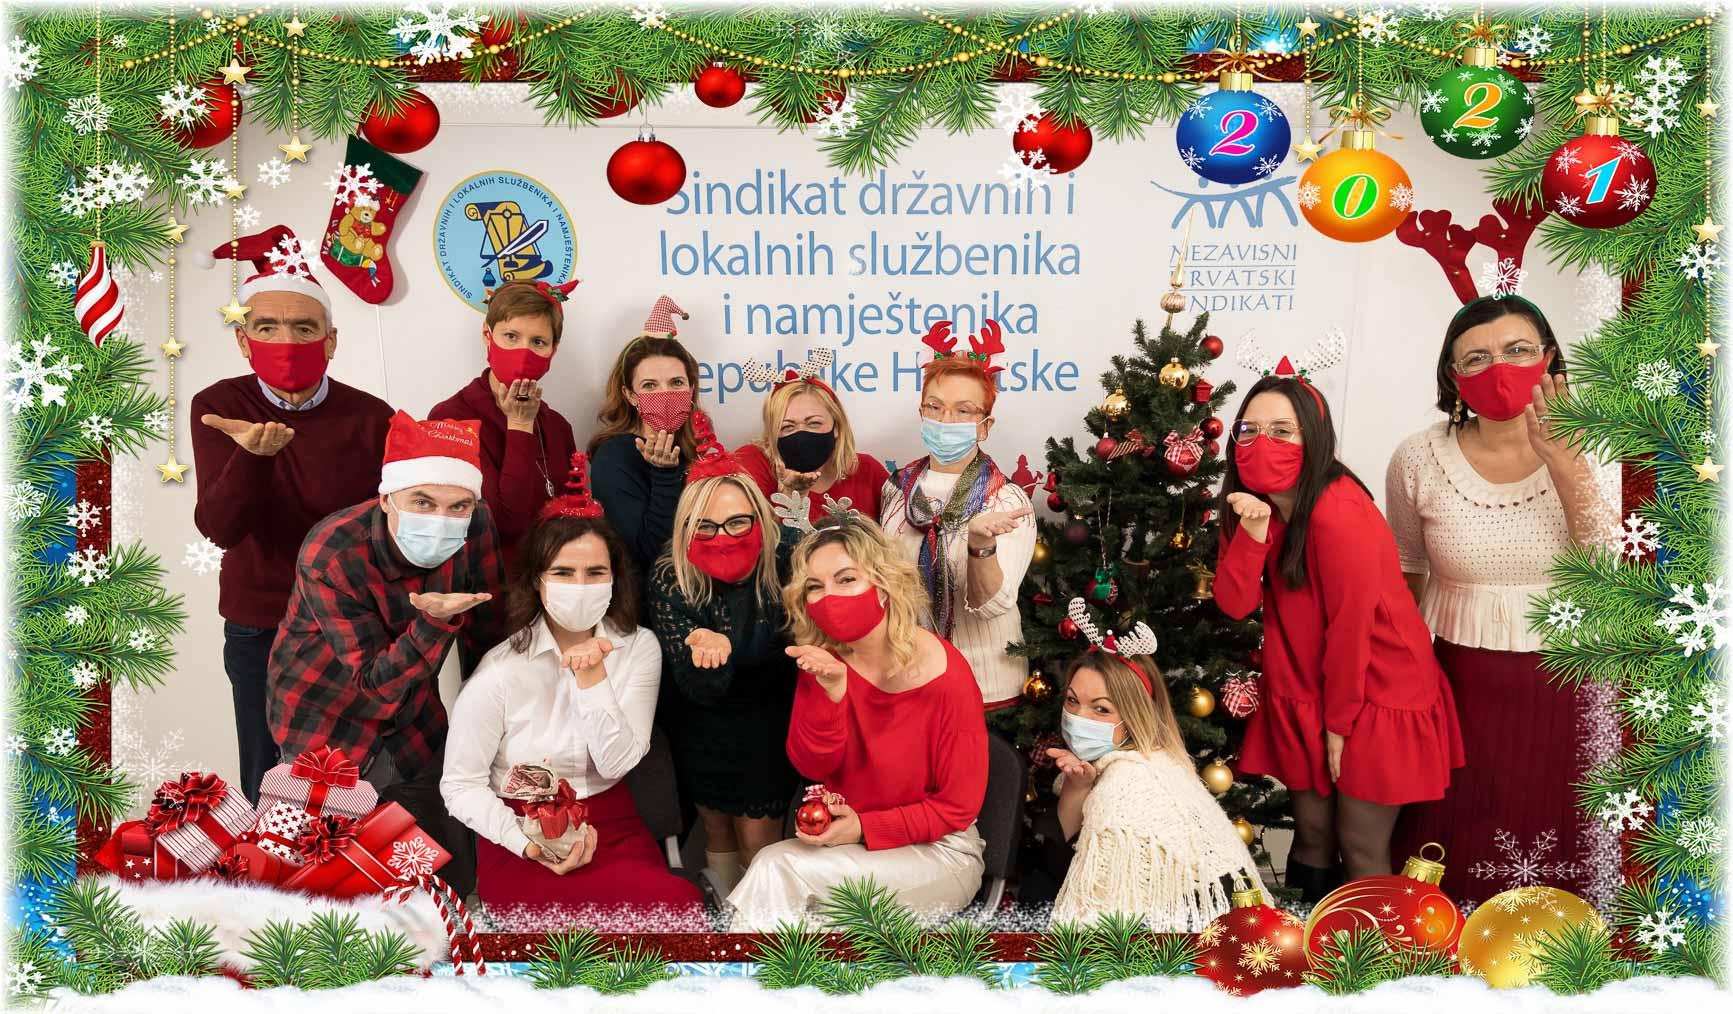 Sretan Božić i Novu 2021 želi Vam SDLSN!